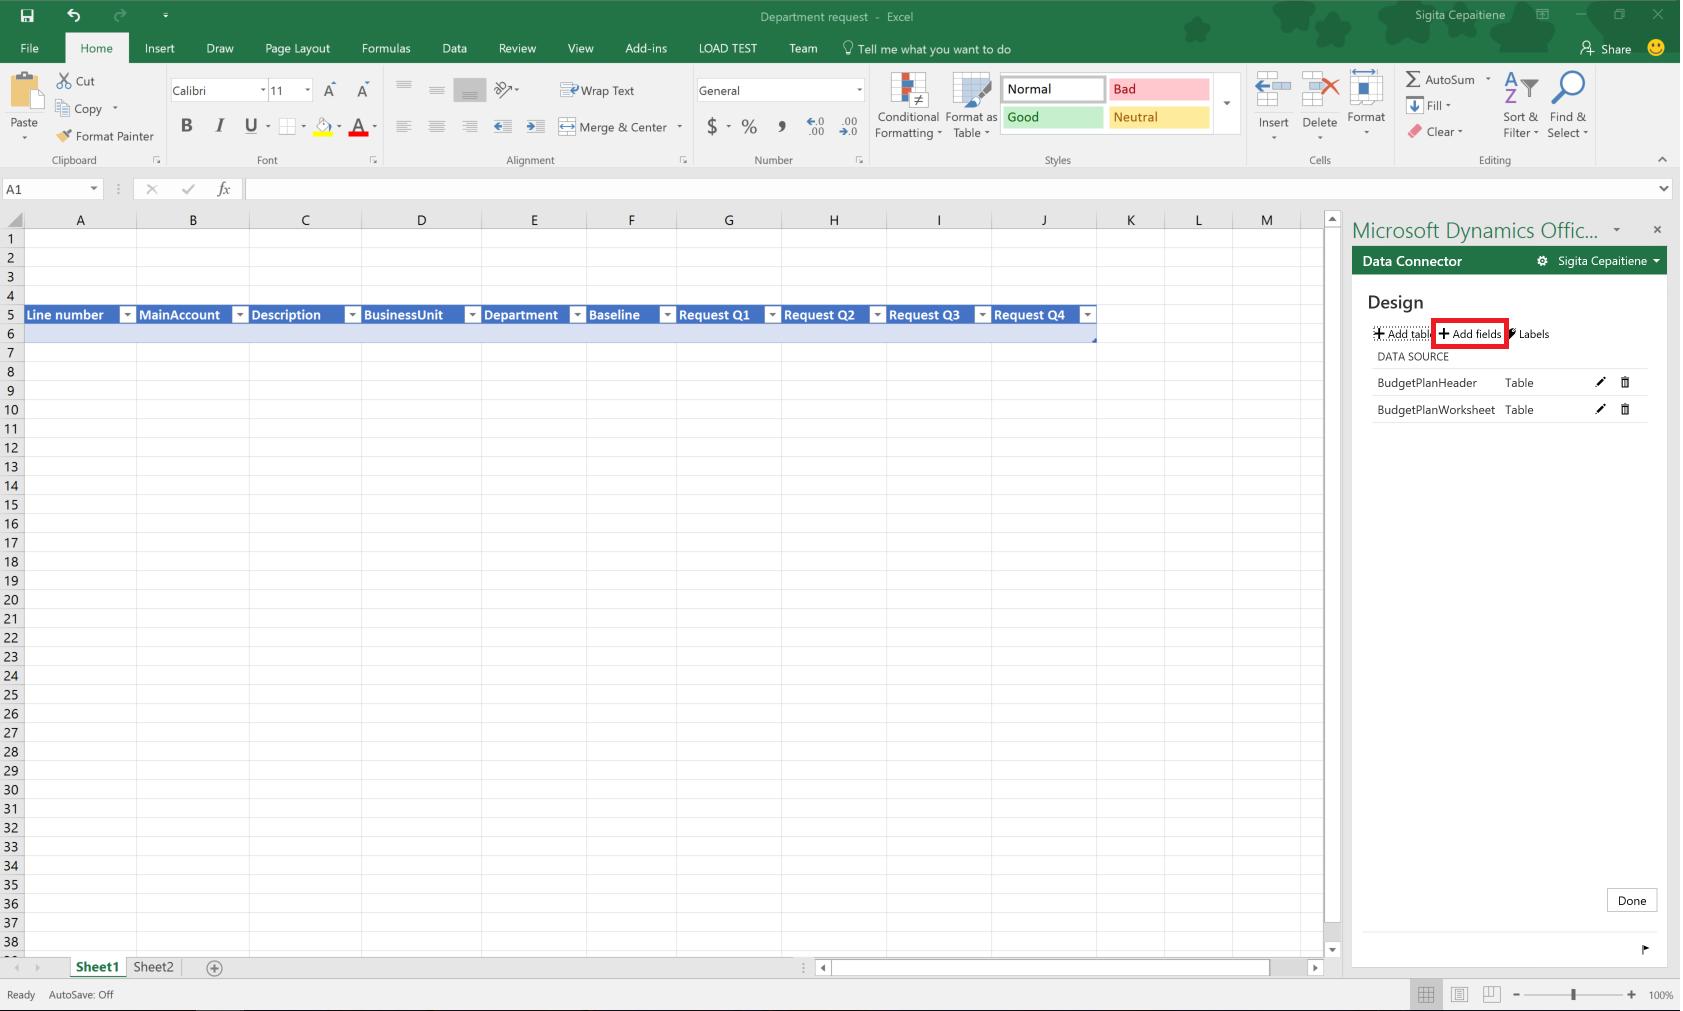 Budgetplanungsvorlage Für Excel Finance Operations Dynamics